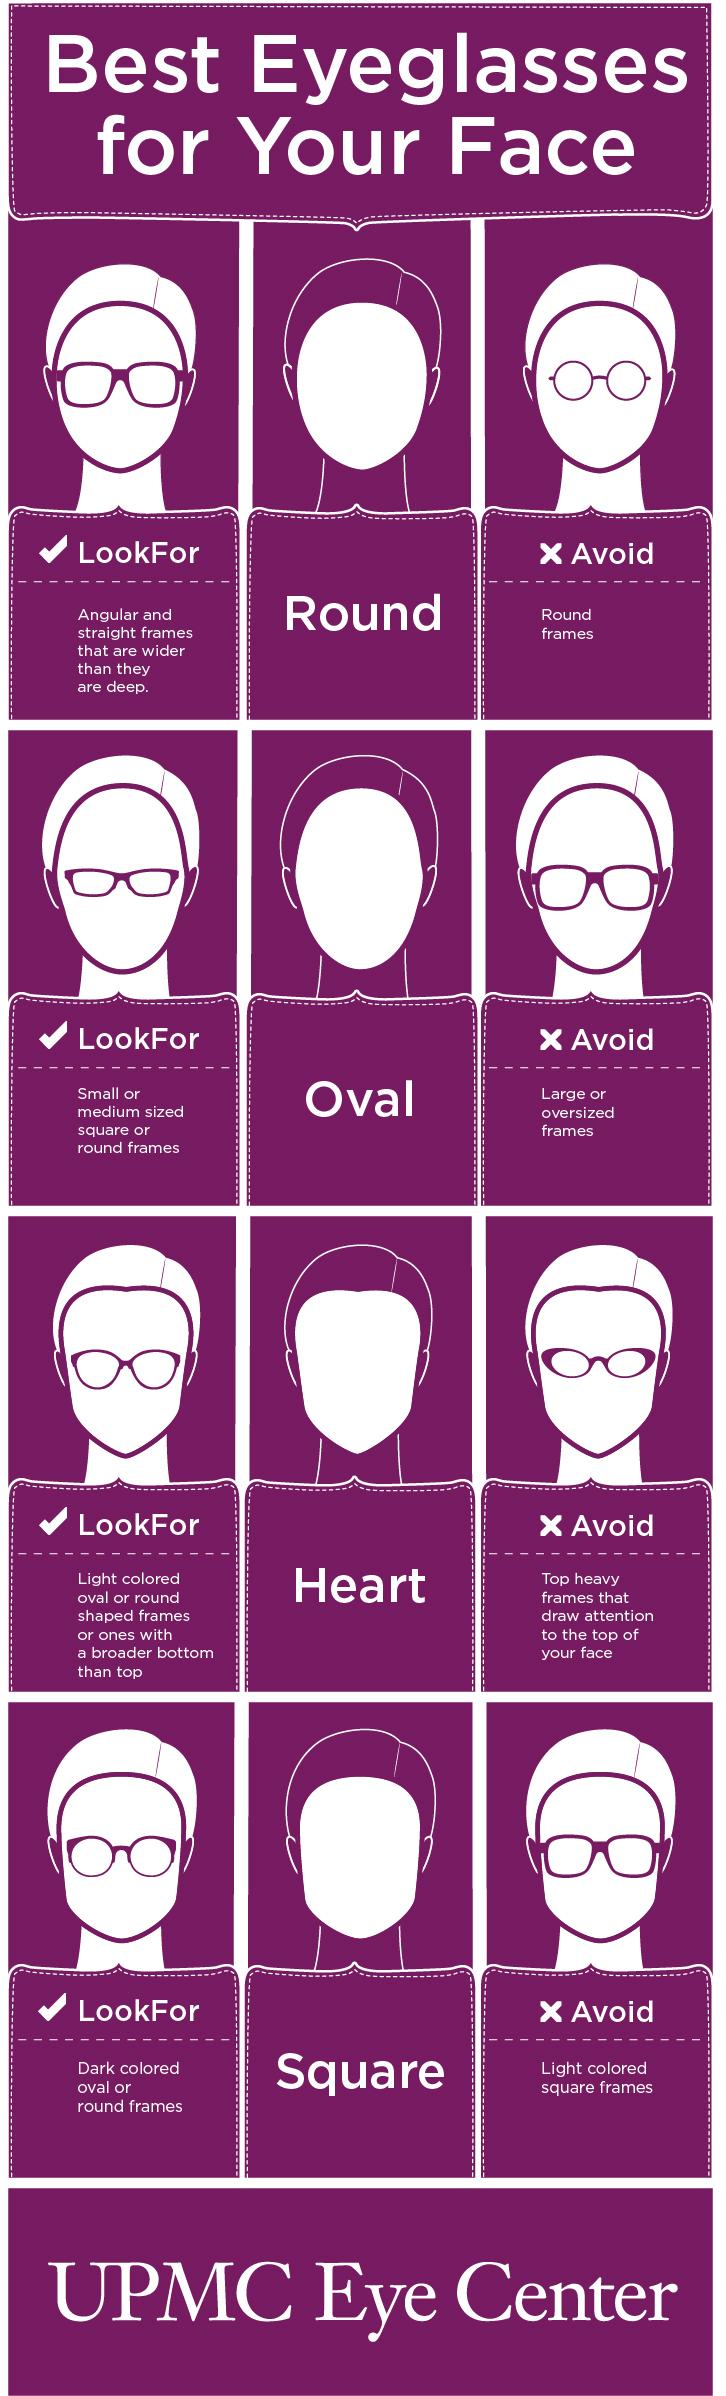 Eyeglasses for Face Shape | UPMC HealthBeat